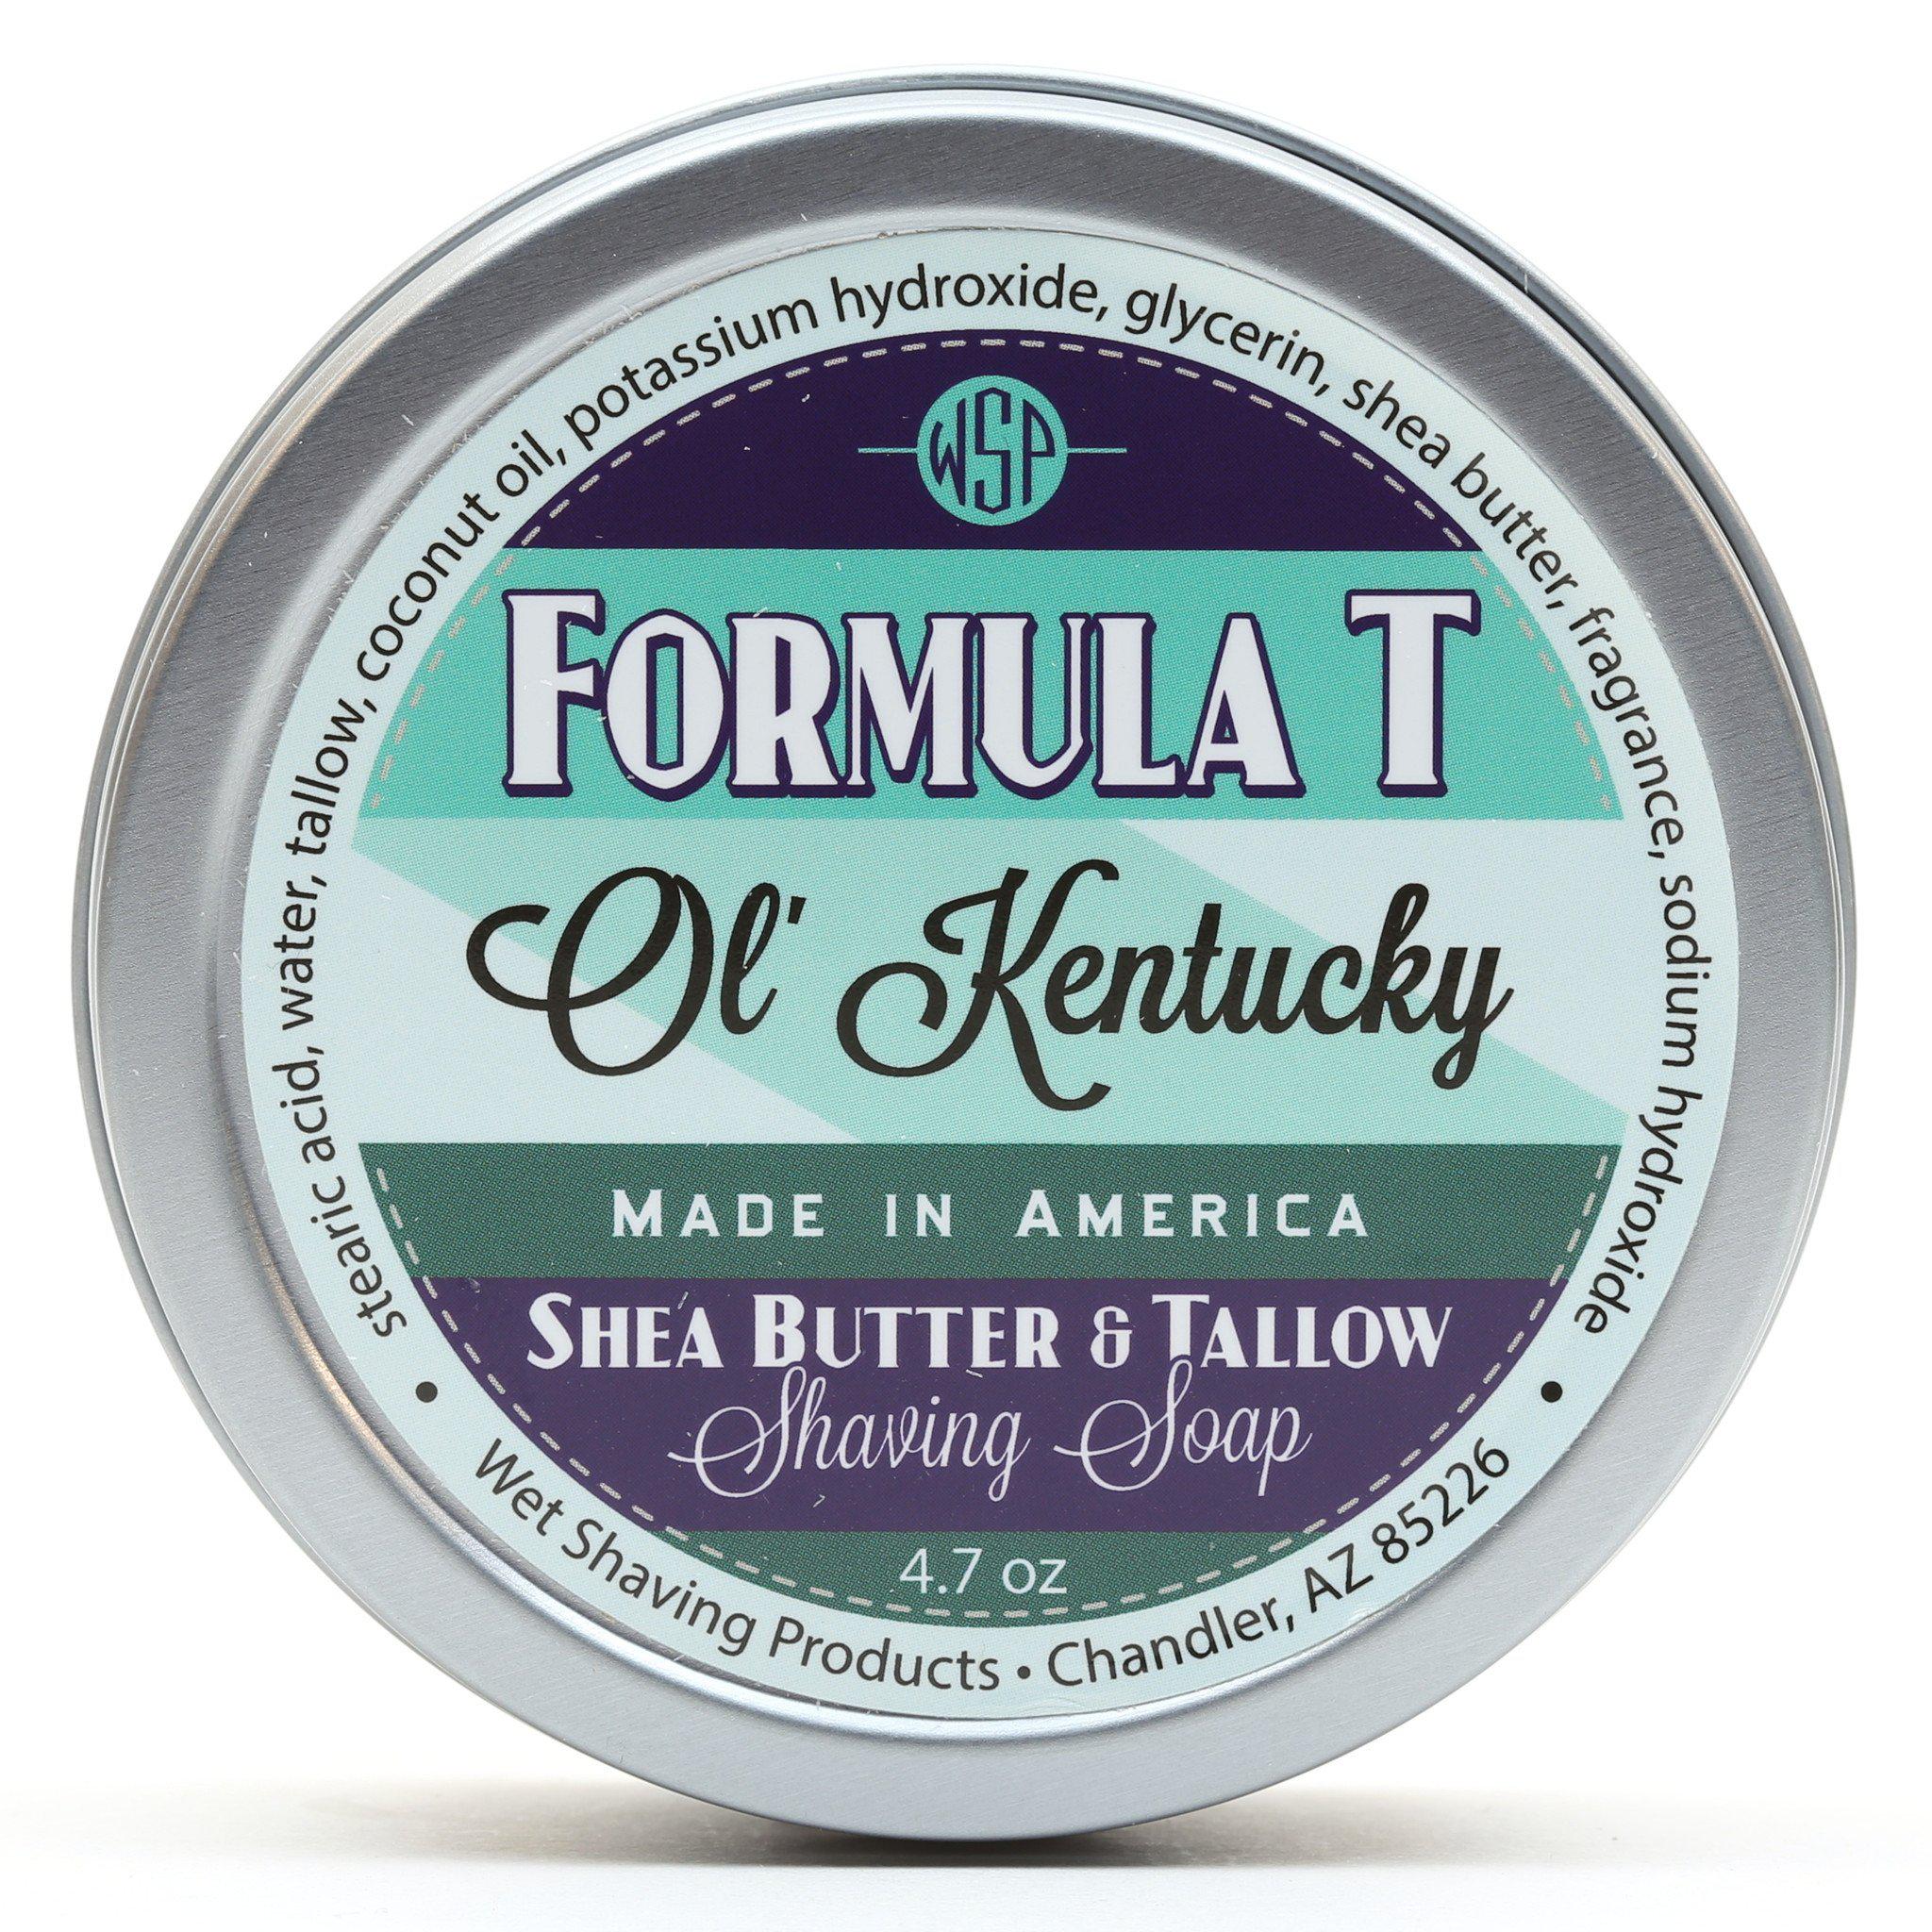 WSP - Formula T Ol' Kentucky - Soap image